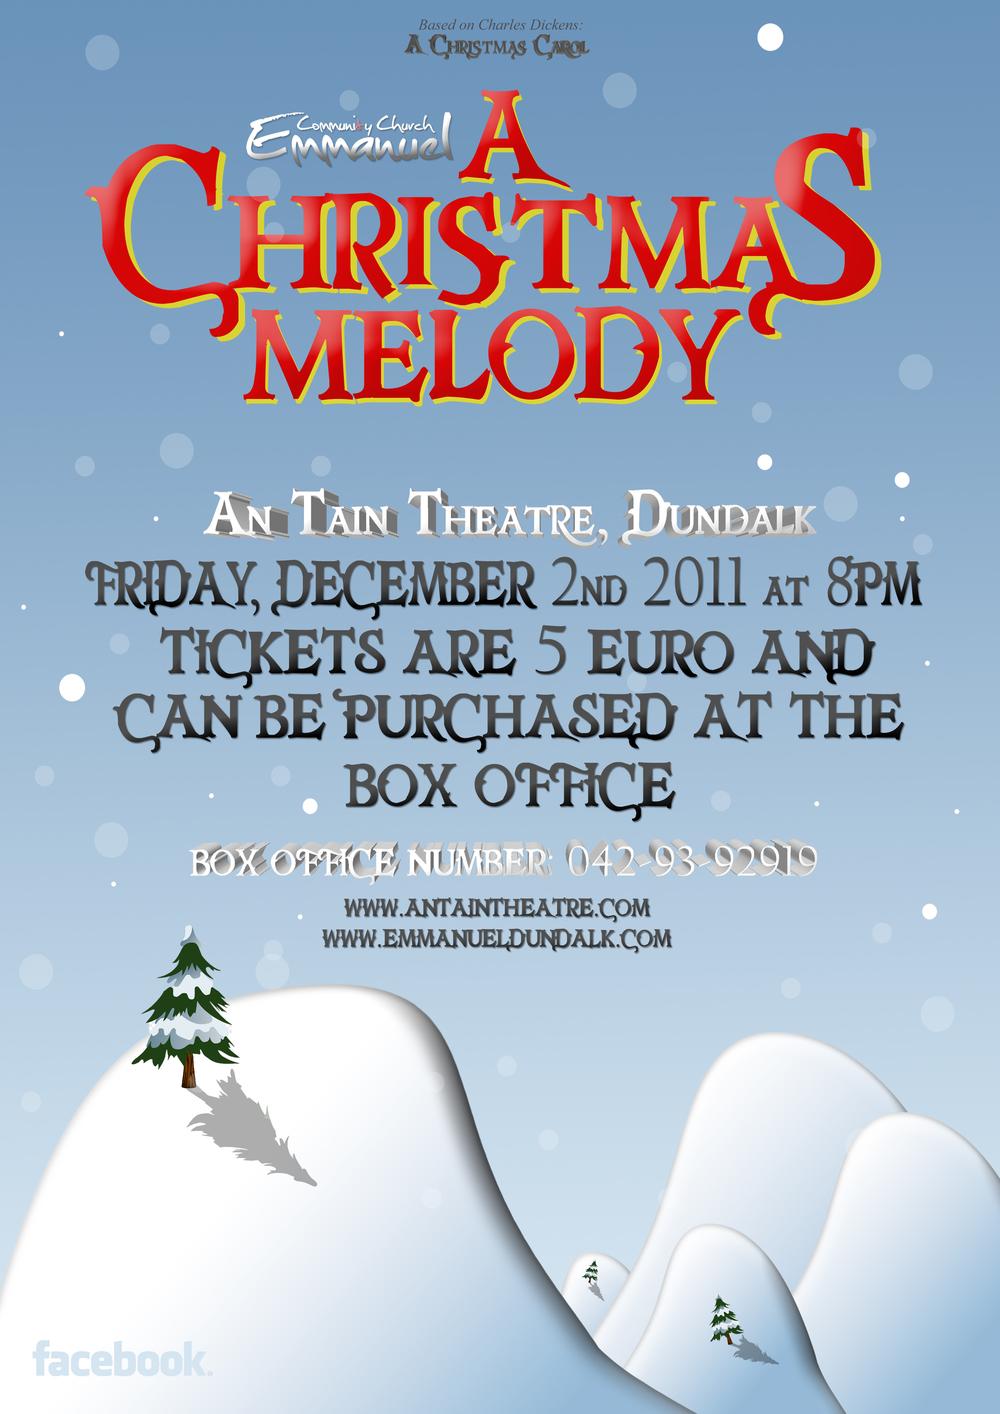 Christmas Melody Poster.jpg